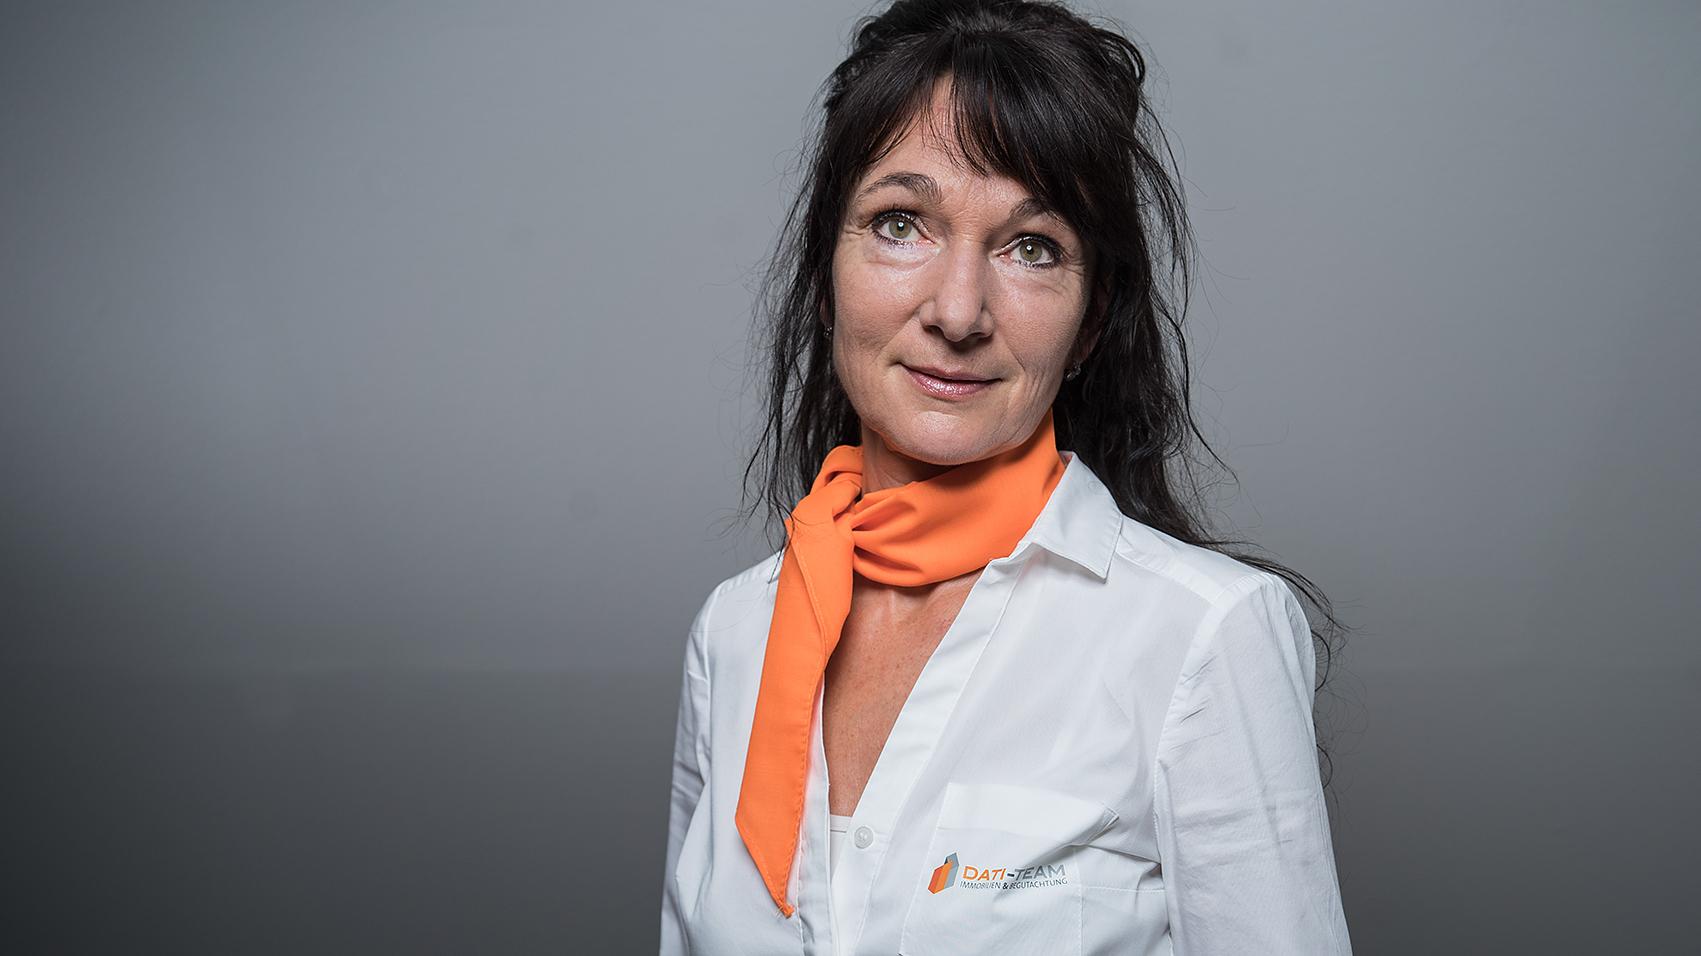 Daniela Strahlendorf